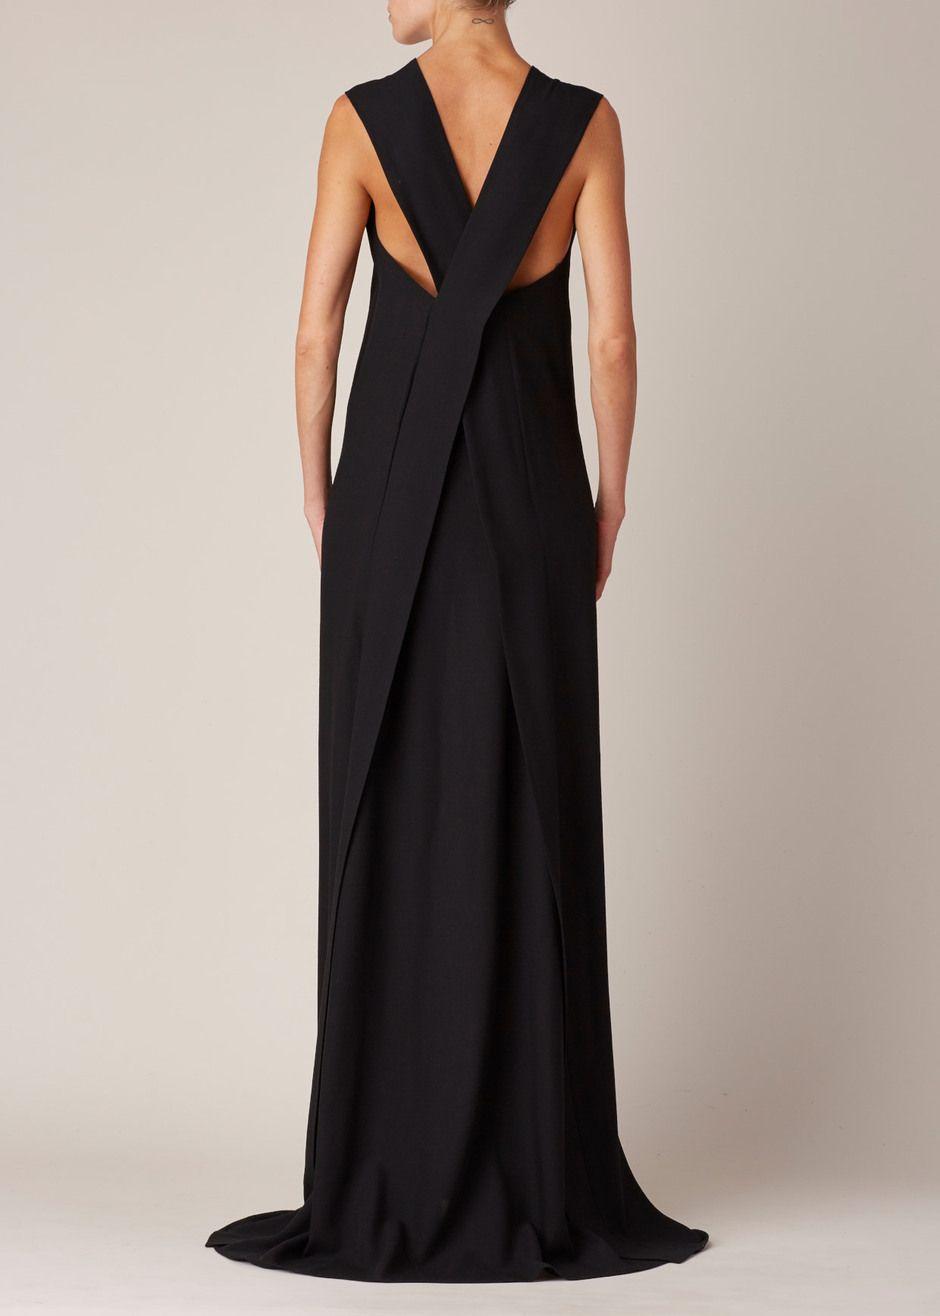 Ann demeulemeester lightlaine dress black wear pinterest